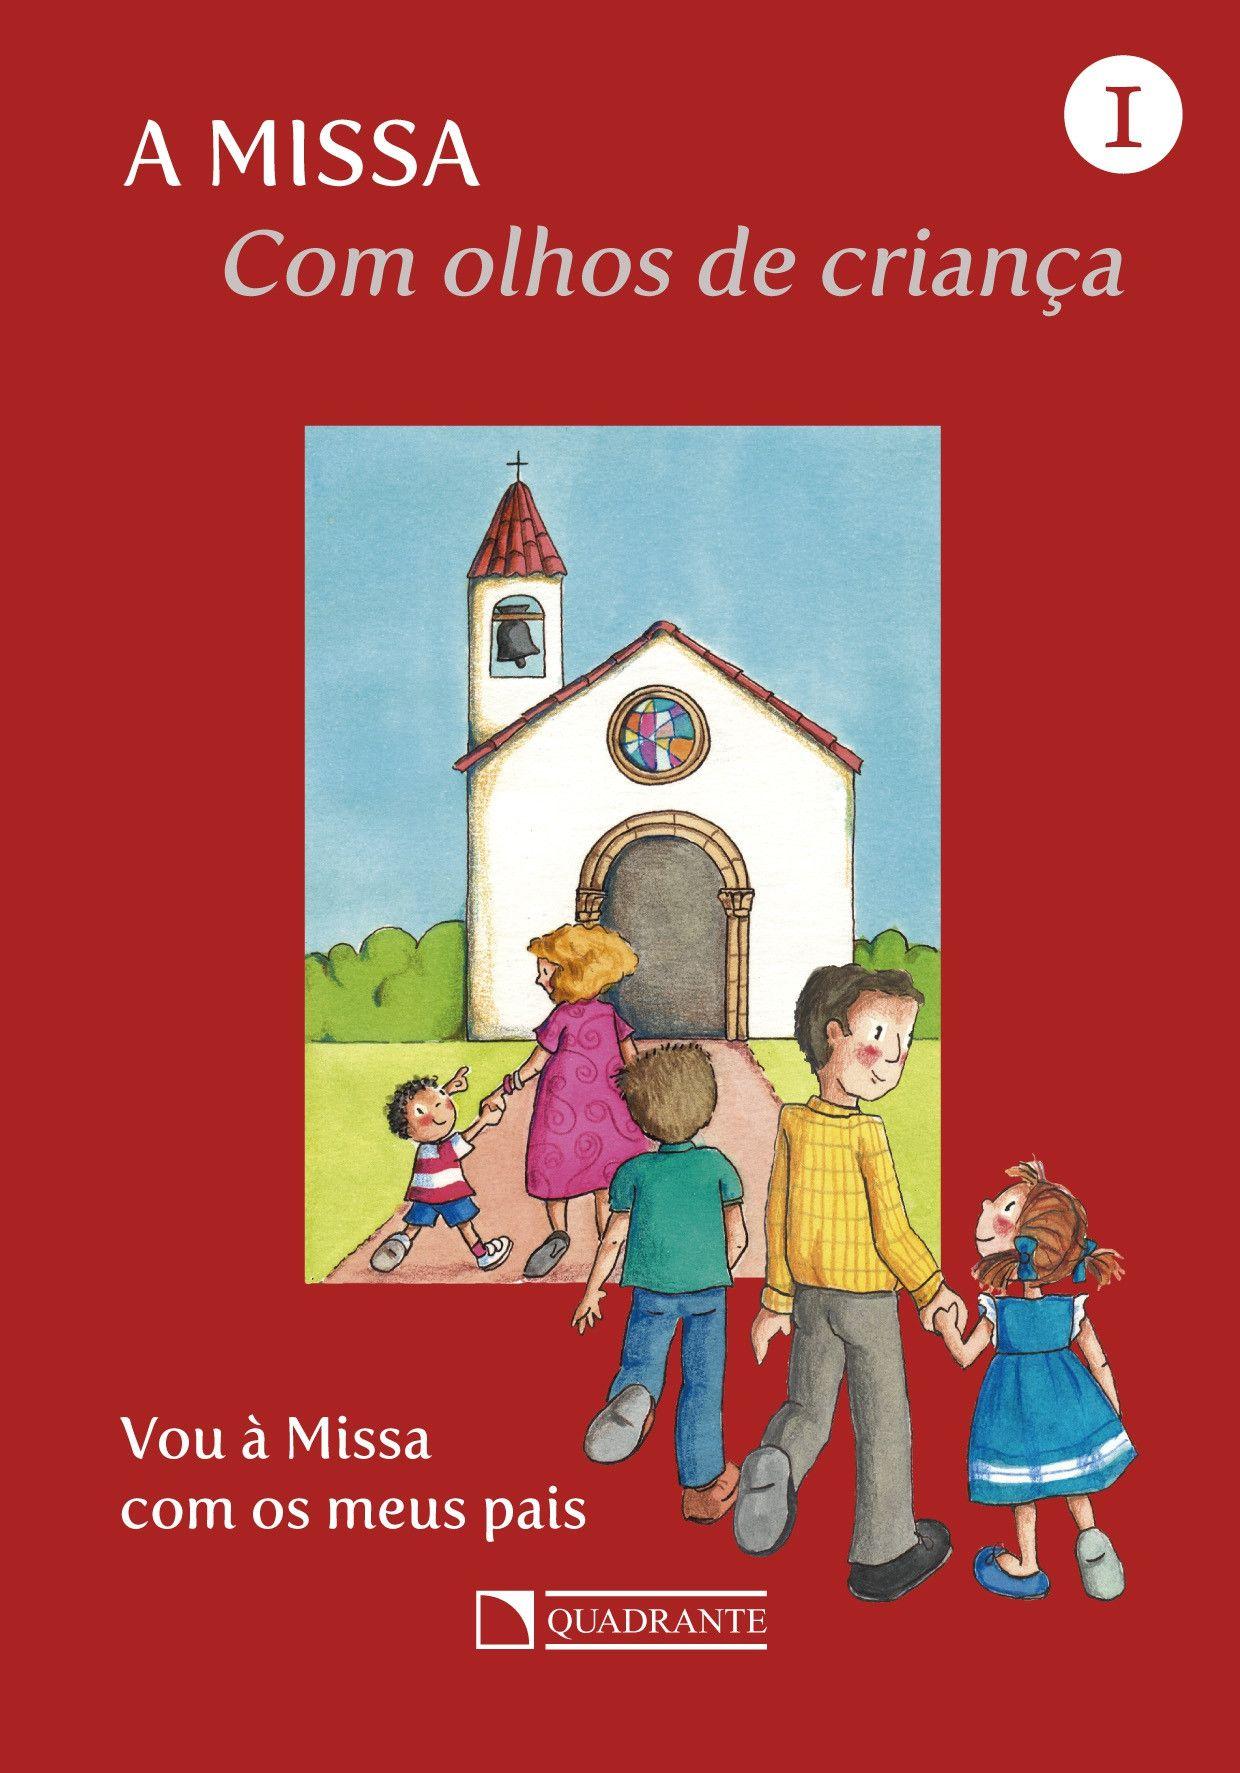 A Missa